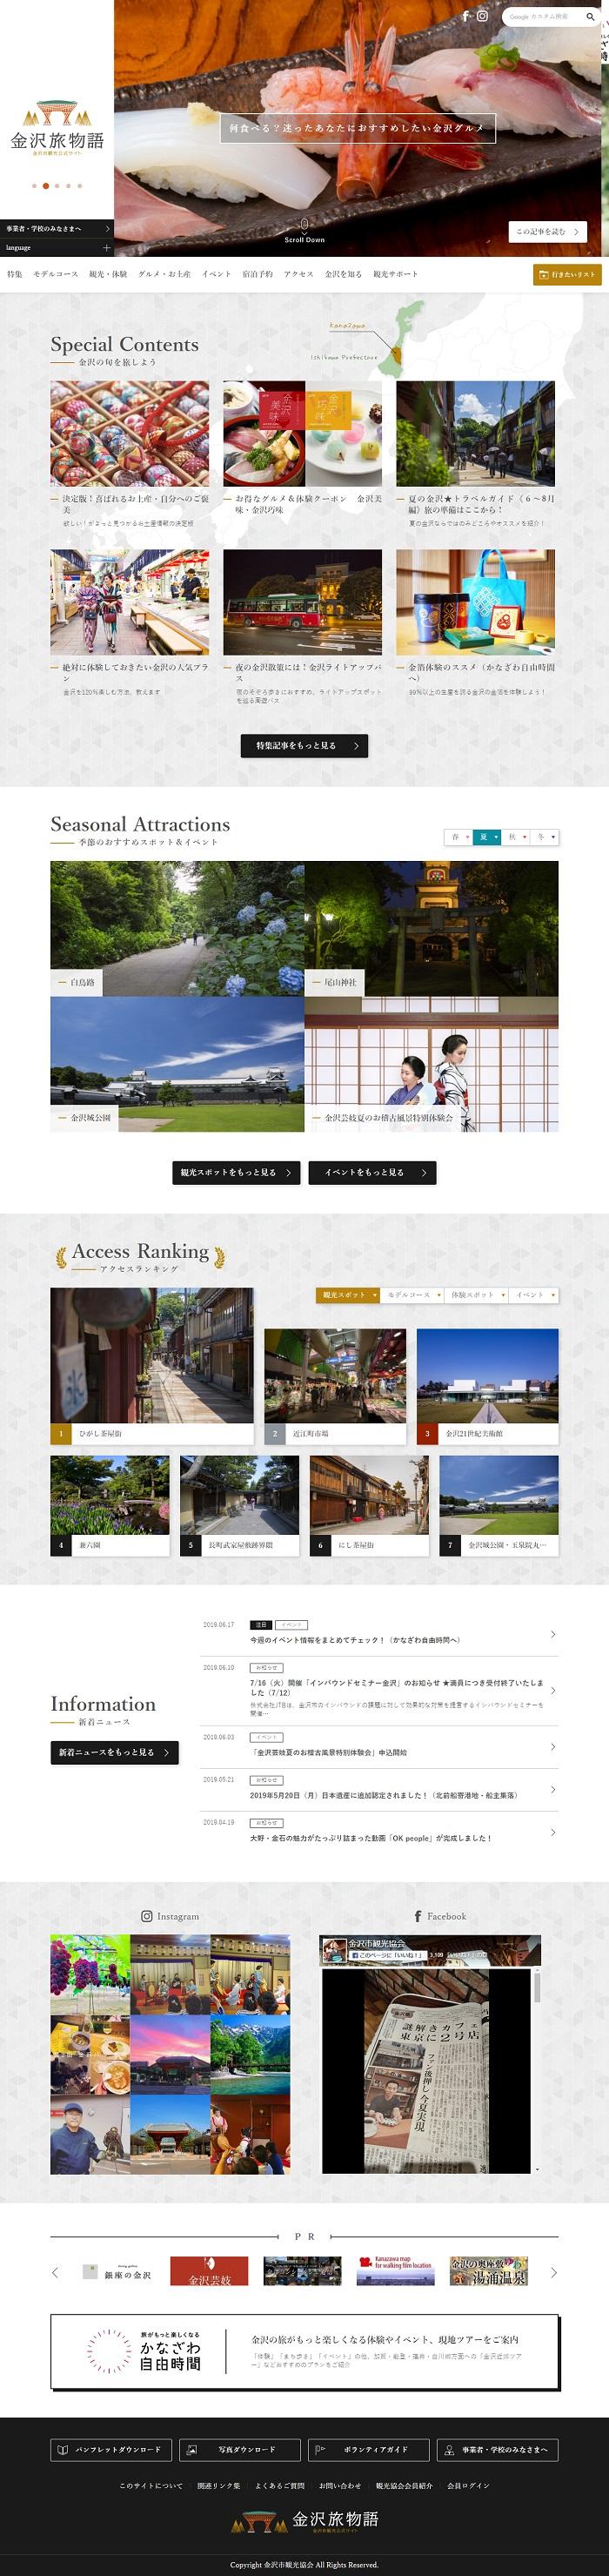 【公式】金沢の観光・旅行情報サイト|金沢旅物語